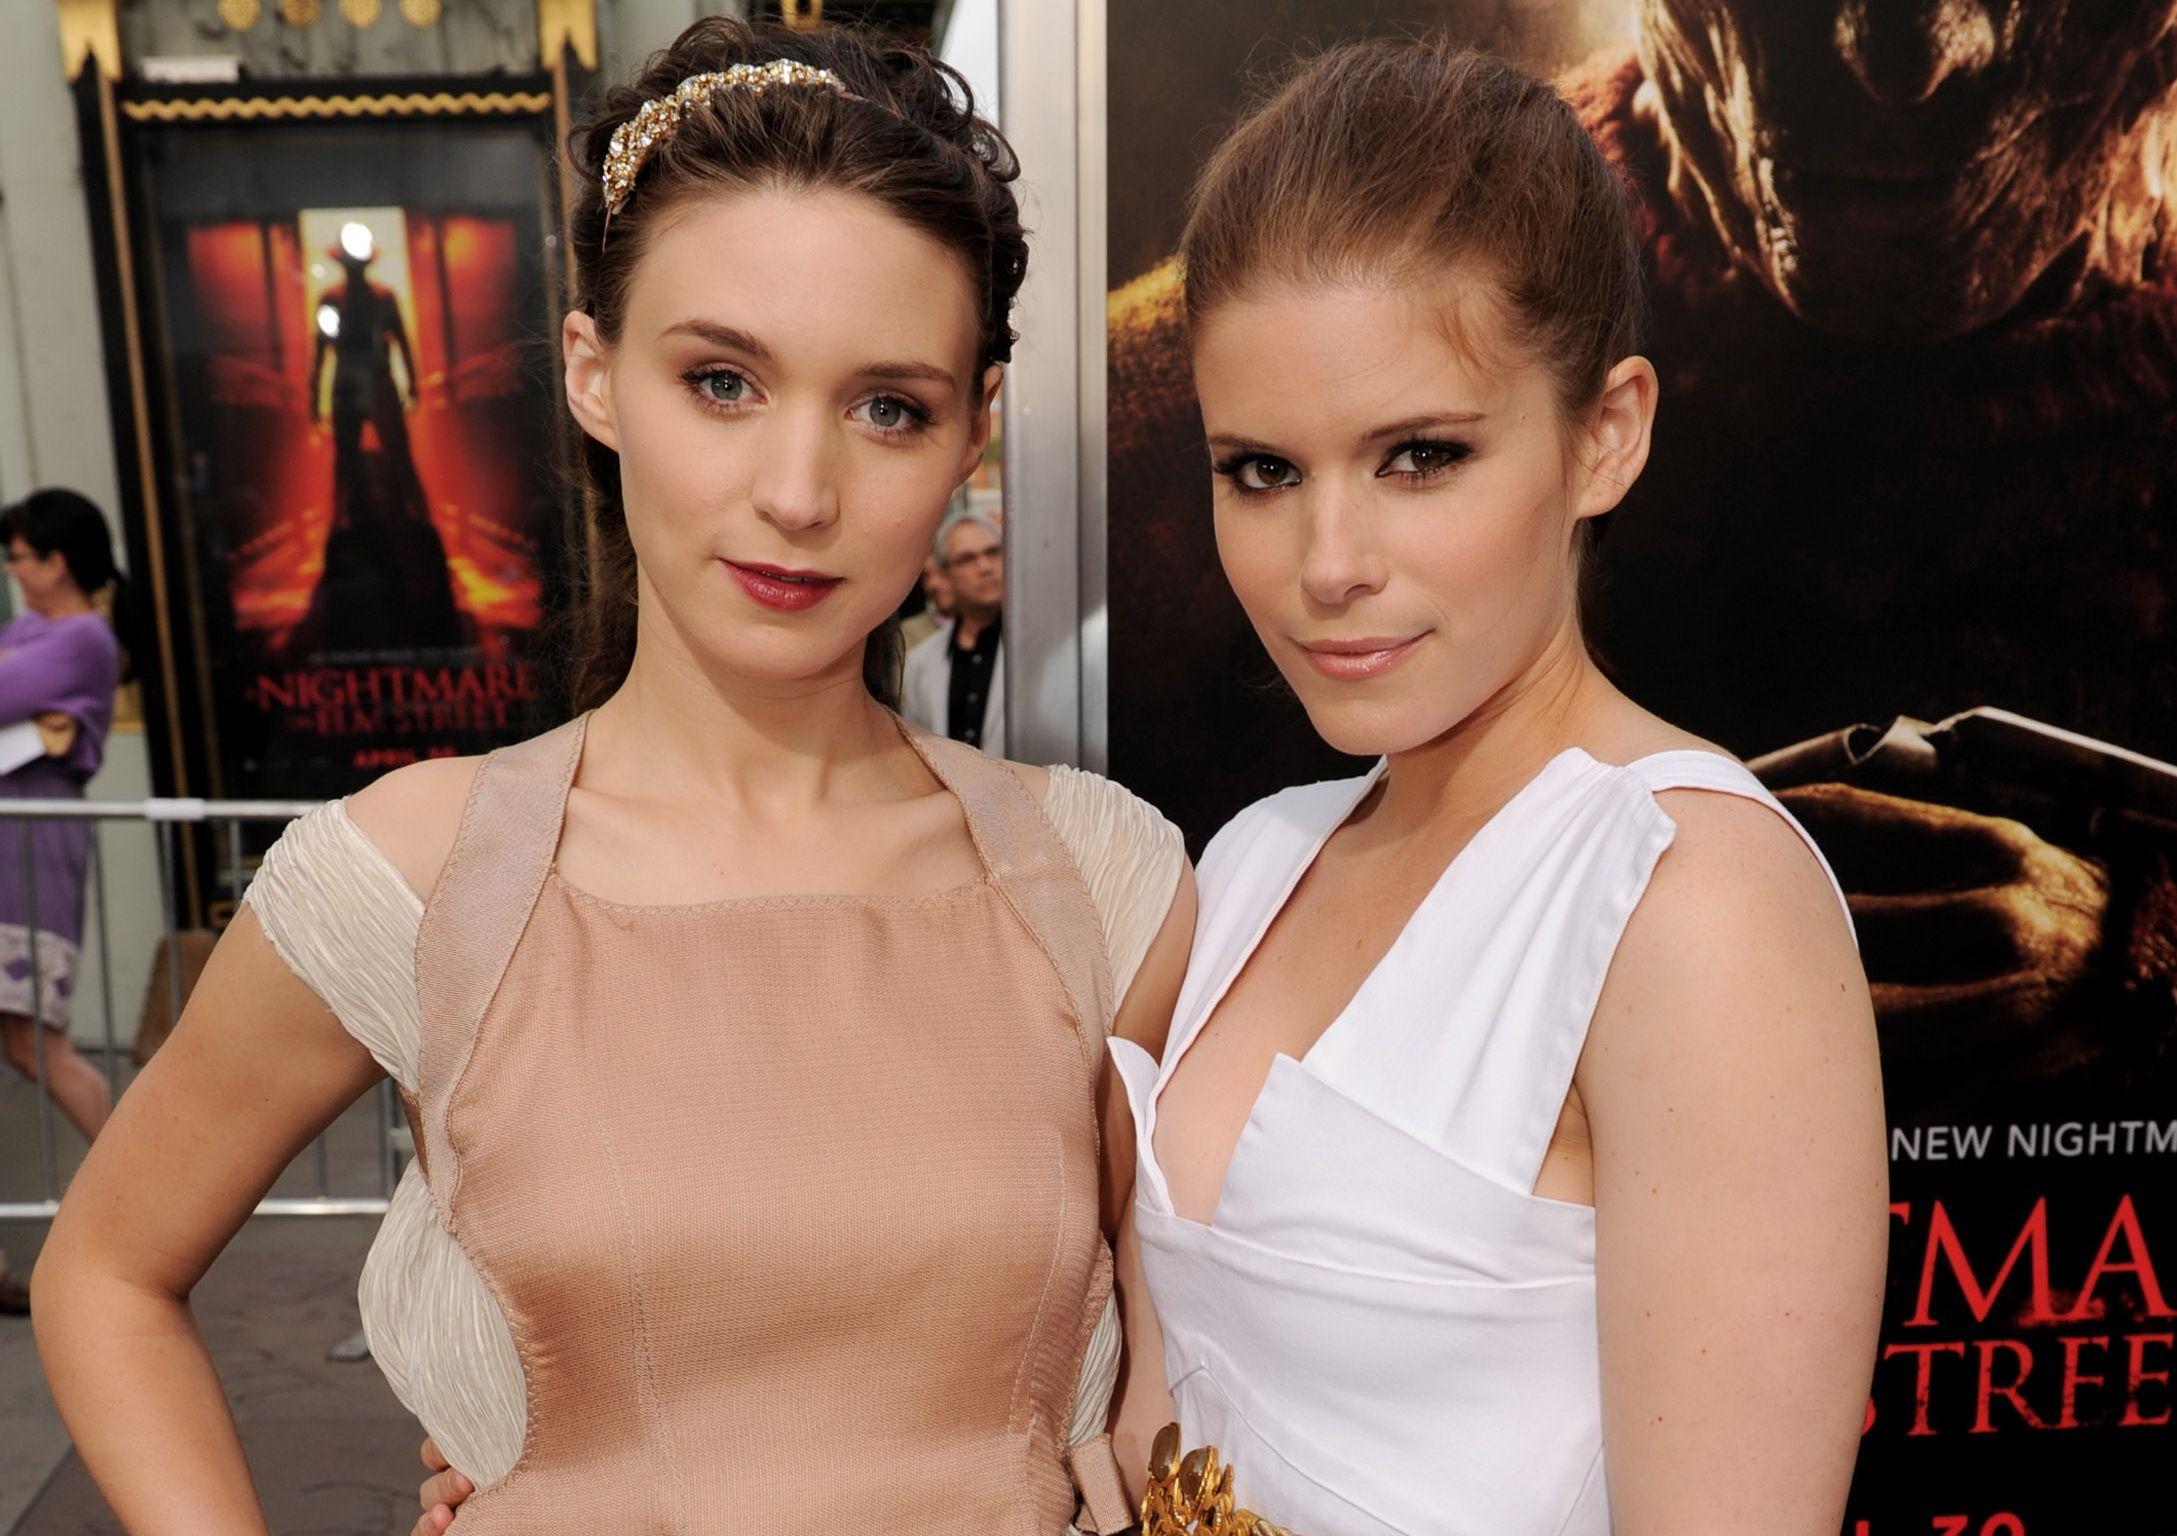 Kate mara and rooney mara dont look alike